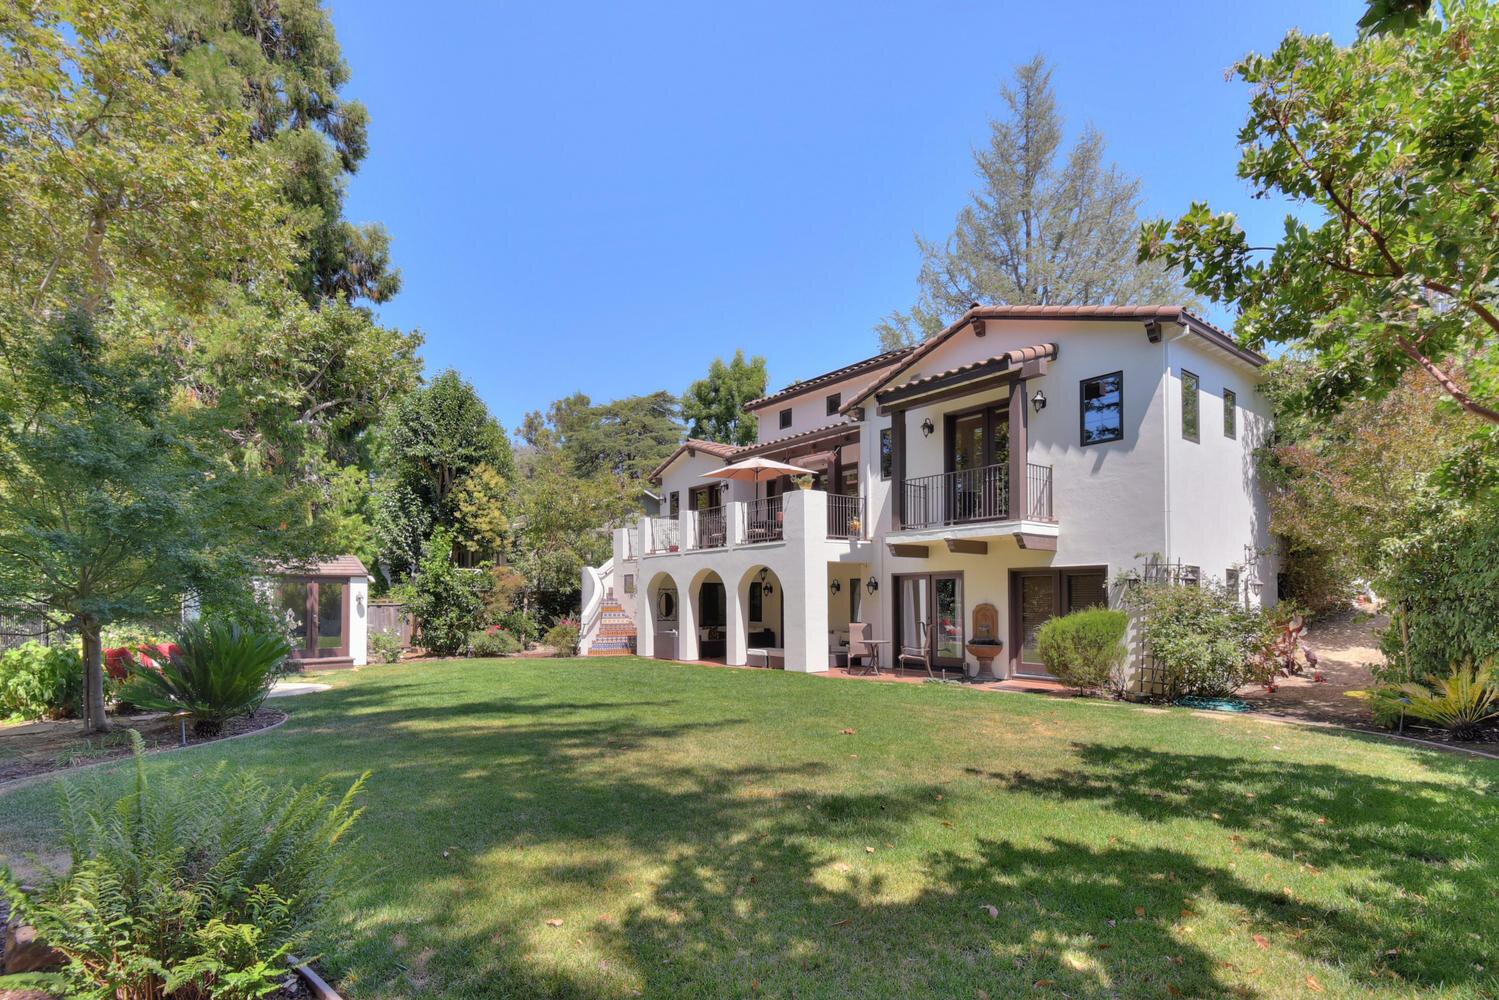 16021 Winterbrook Rd Los Gatos-large-073-067-Back of House tw-1500x1000-72dpi.jpg